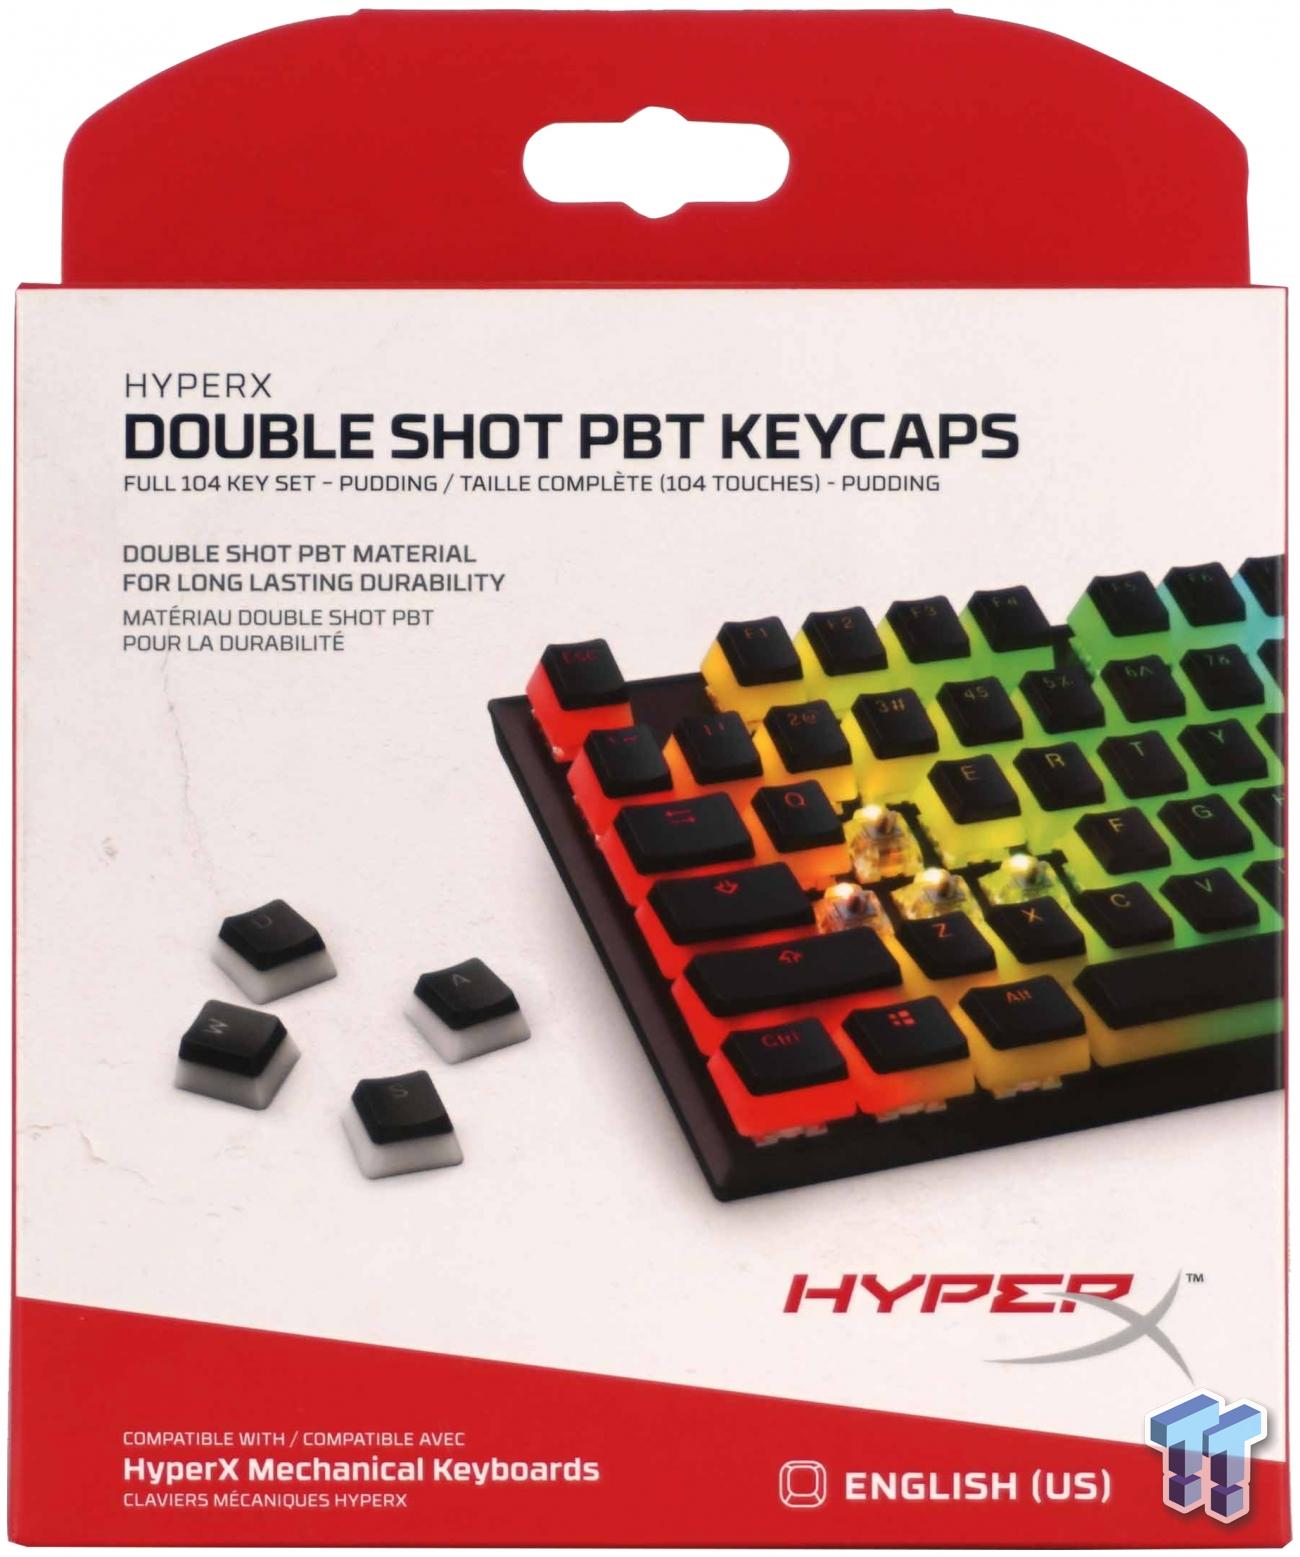 HyperX Double Shot PBT